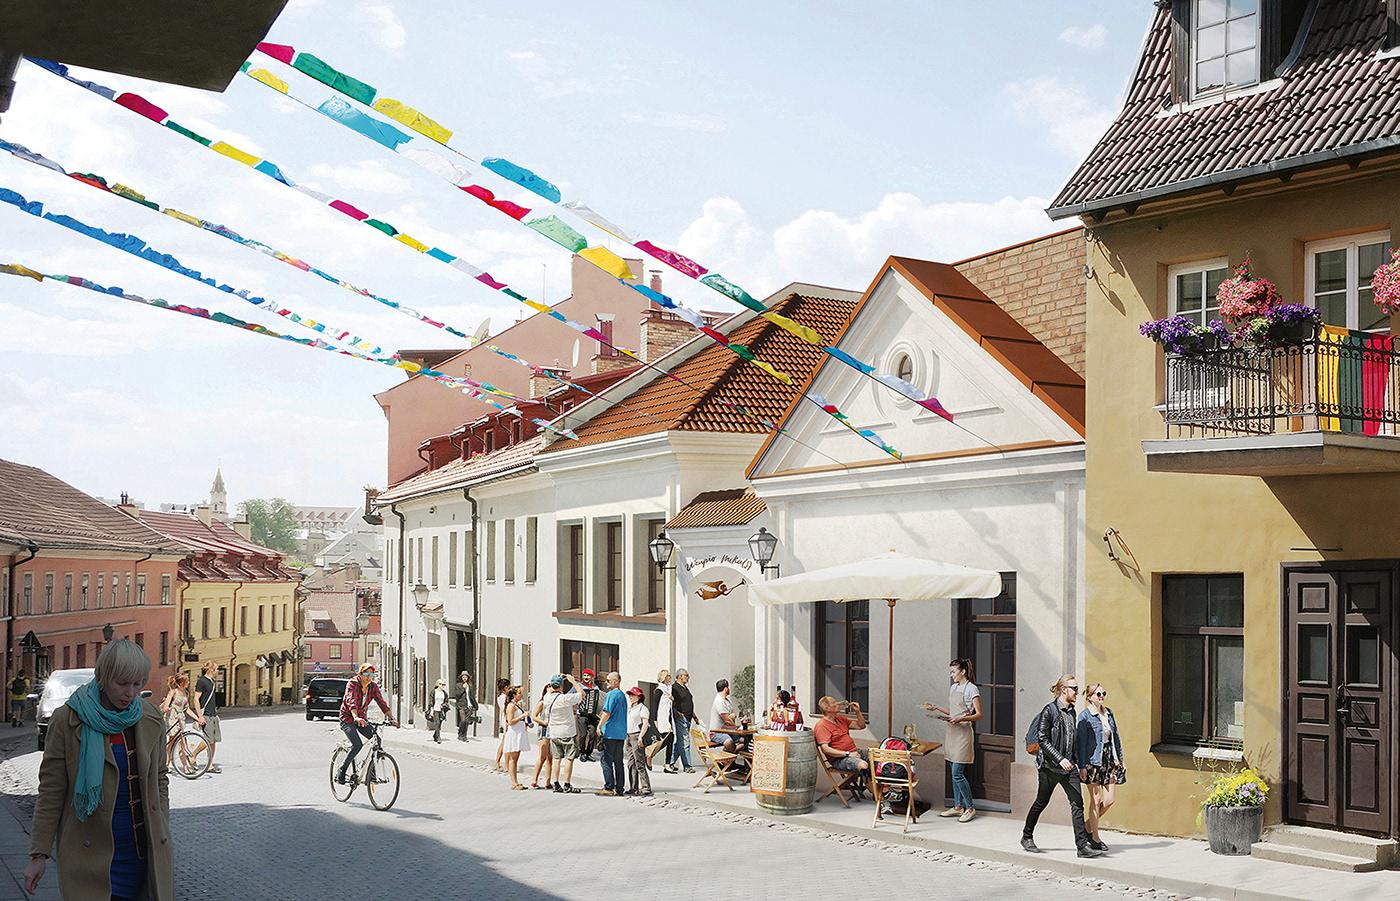 oldtown visual visualization vilnius visualisation lithuania architecture